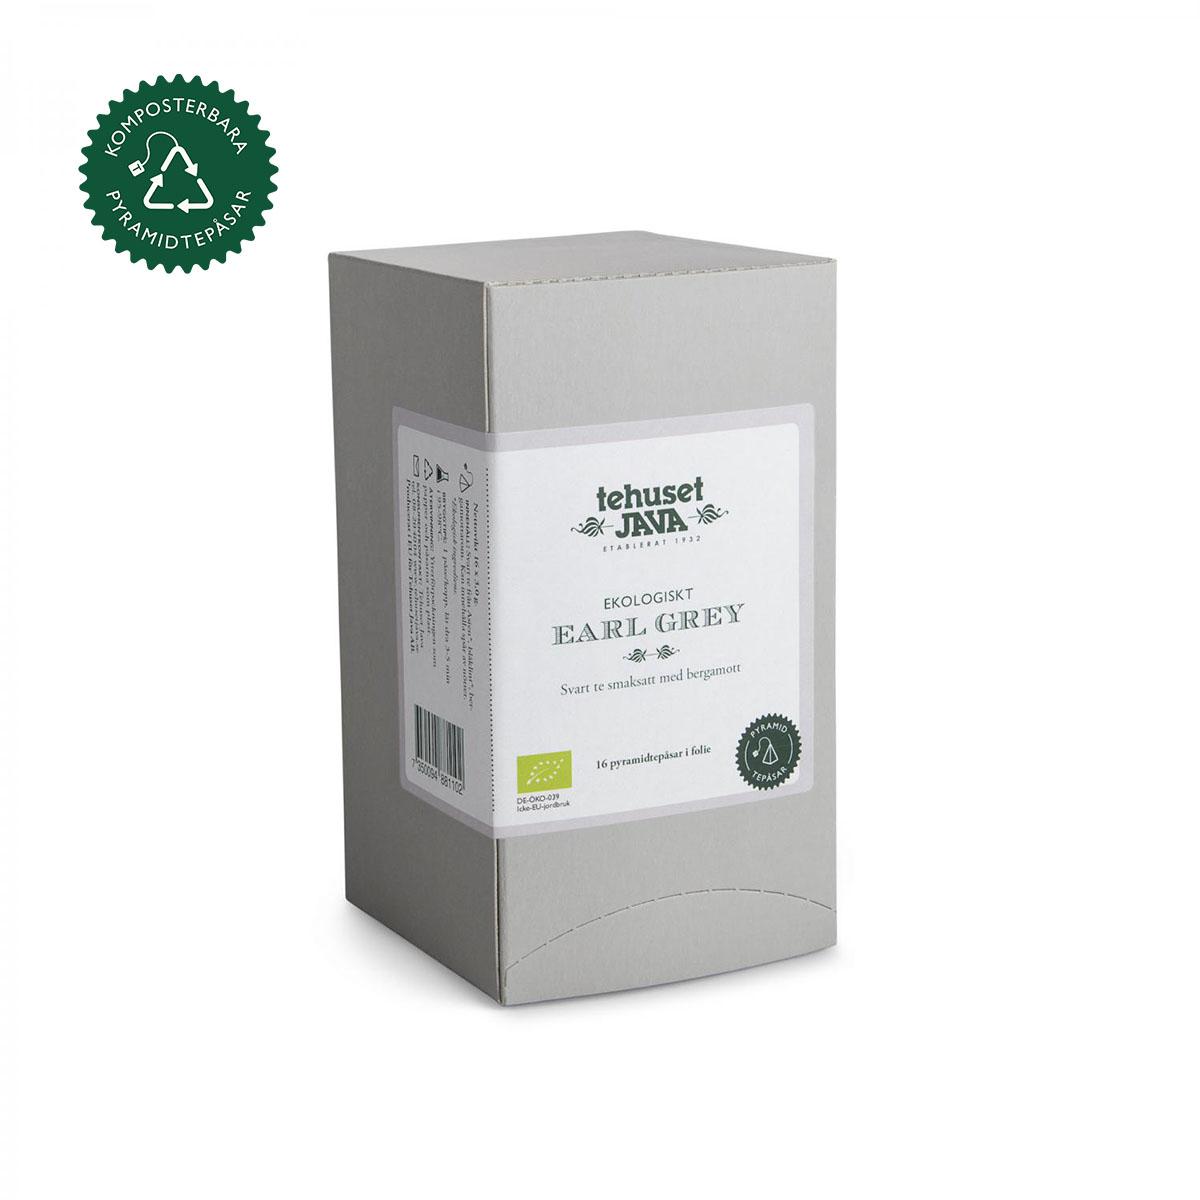 Ekologisk Earl Grey 16 pack Tepåsar i folie